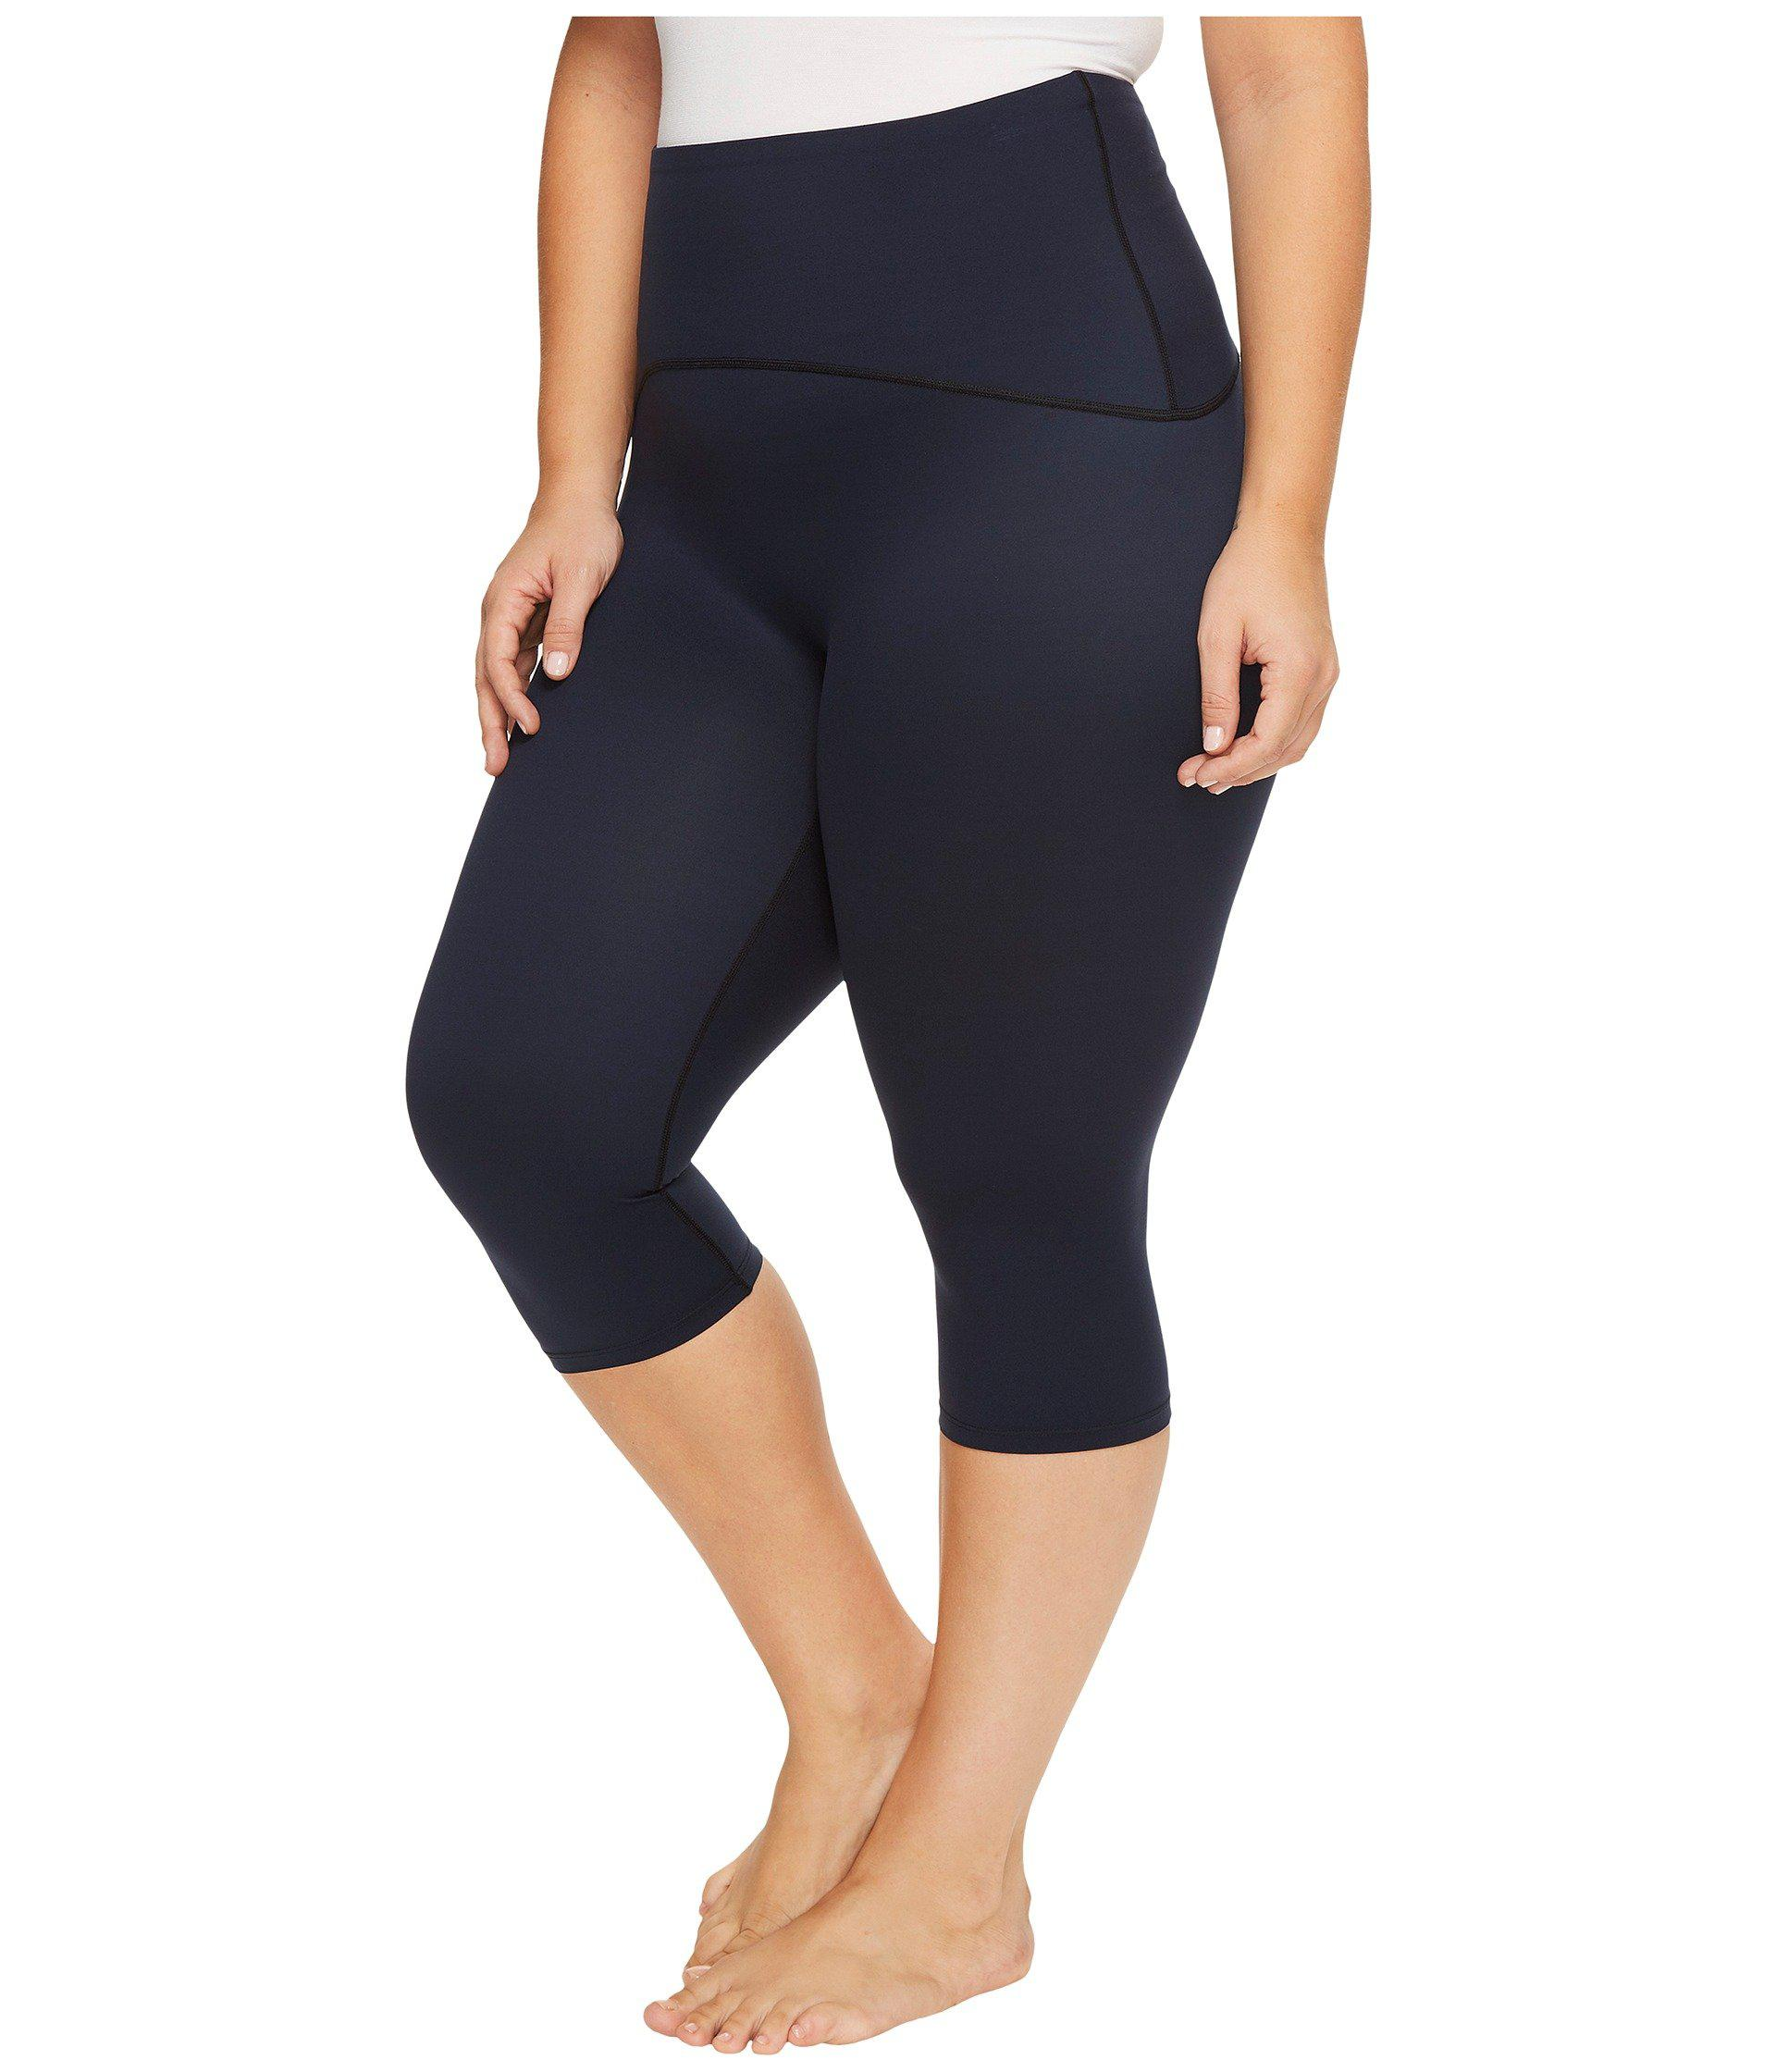 e276e50550fce Lyst - Spanx Plus Size Active Compression Knee Pants in Blue